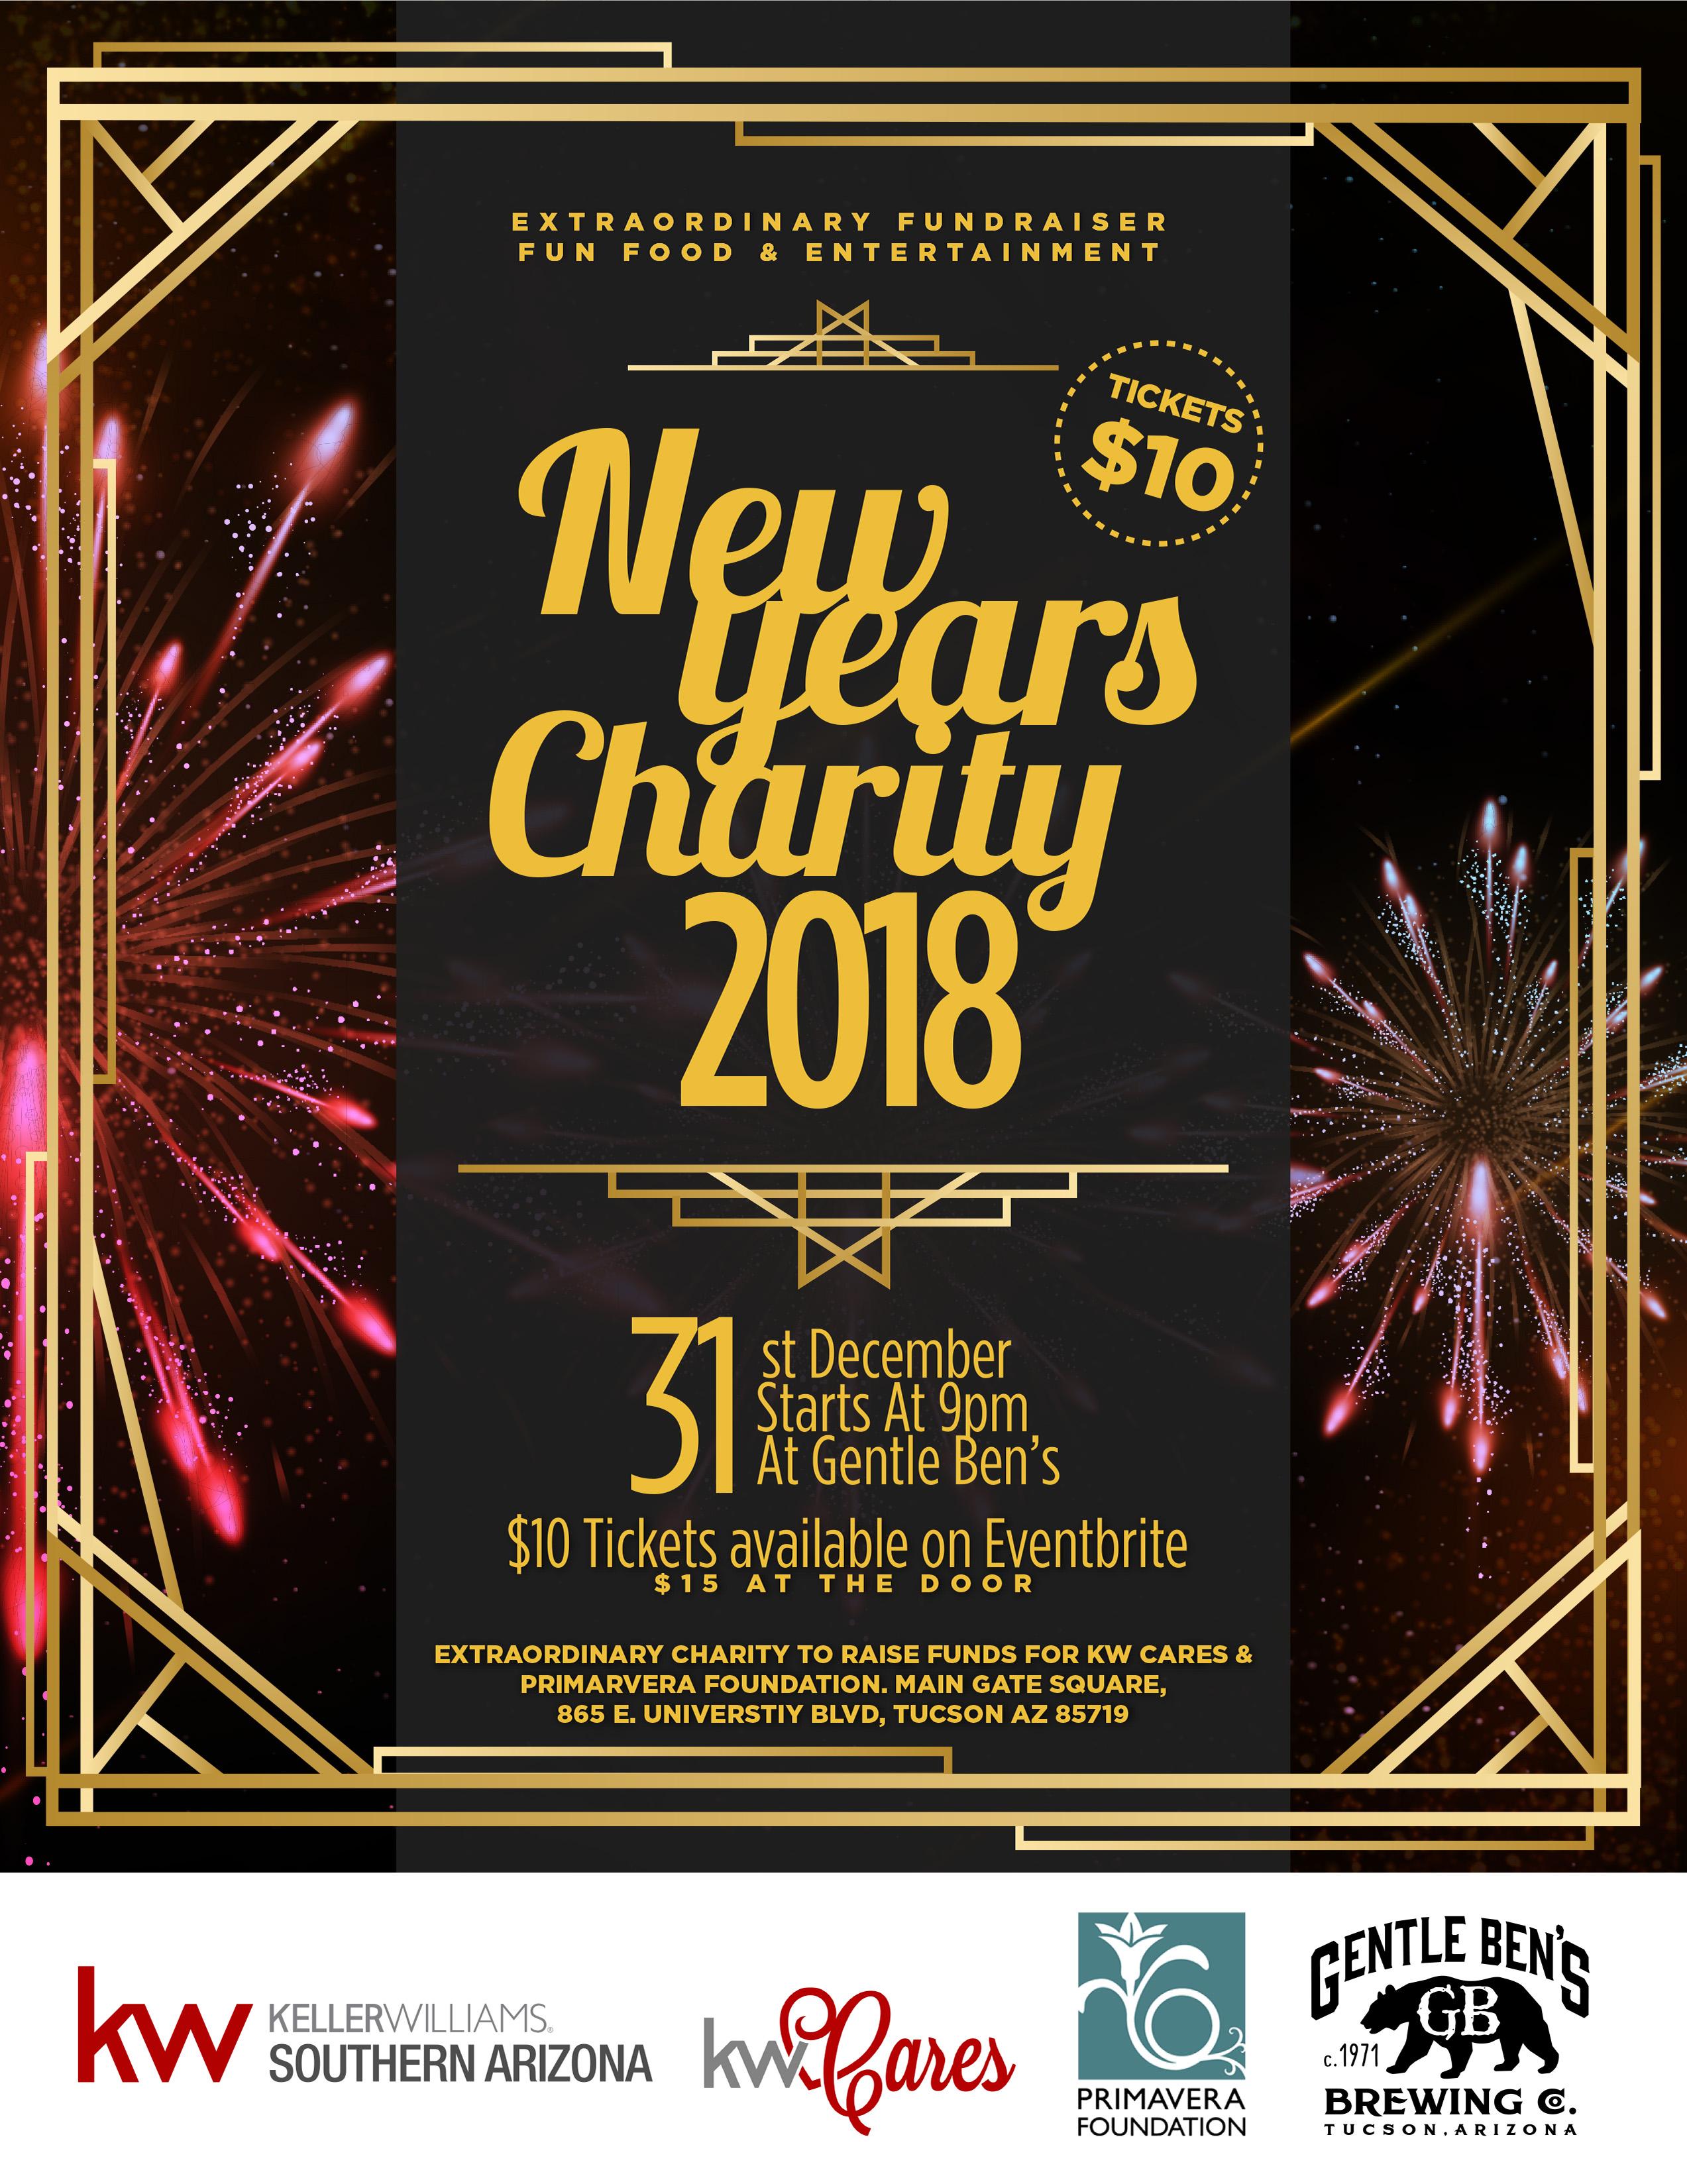 Keller Williams of S. AZ's New Year's Eve Fundraiser to Benefit Primavera